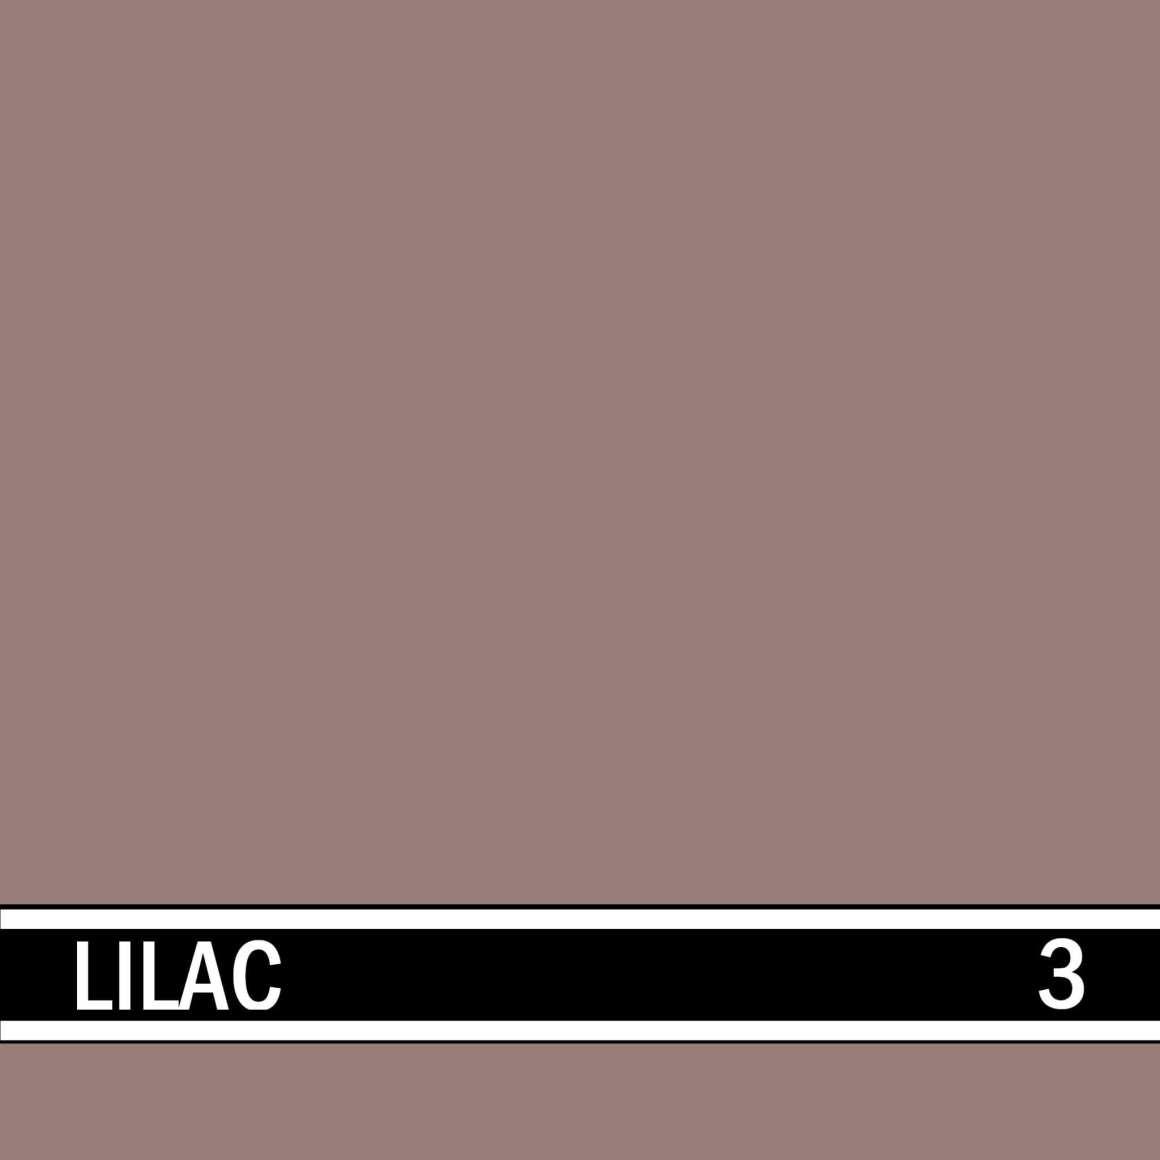 Lilac integral concrete color for stamped concrete and decorative colored concrete